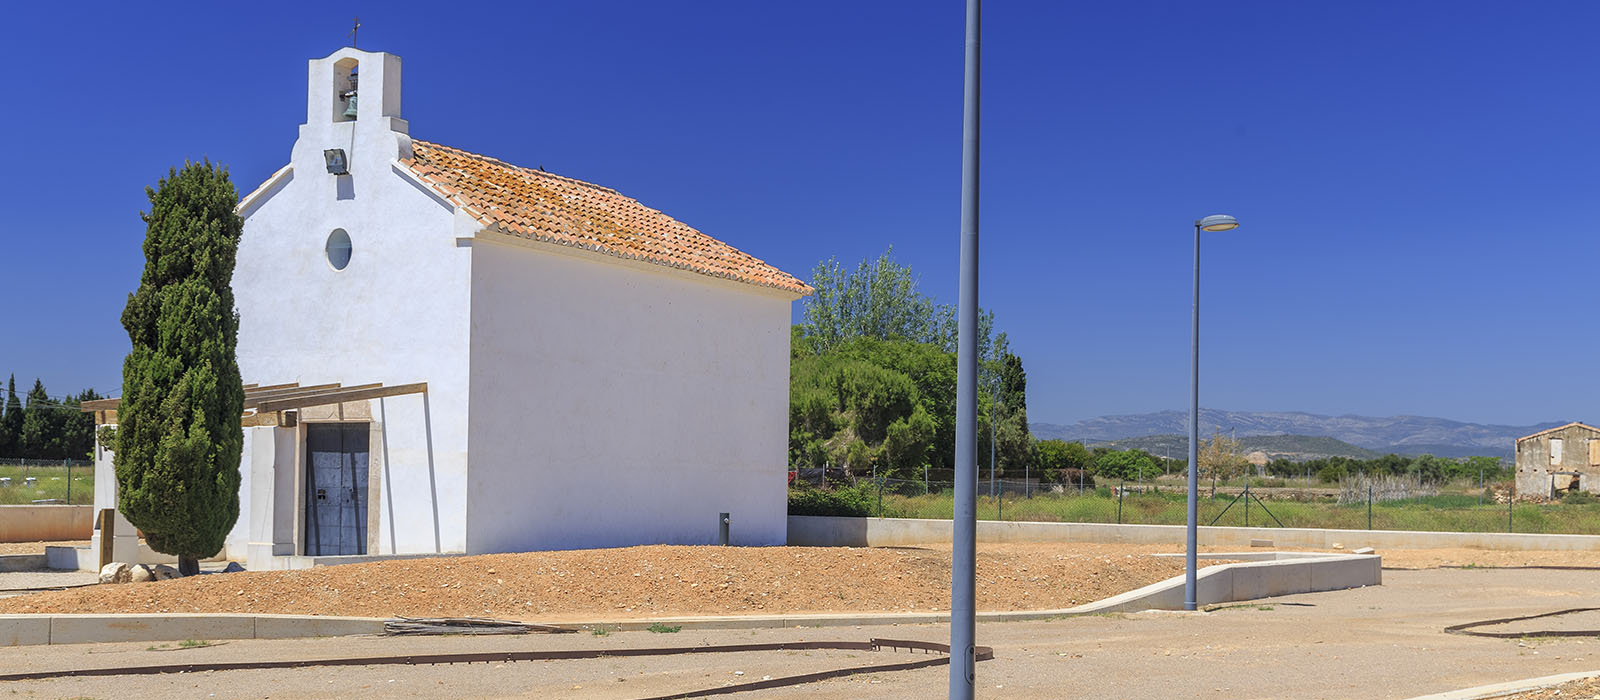 Turismo-Alcossebre_Alcala_de_Xivert_Fiestas_CapiCorb